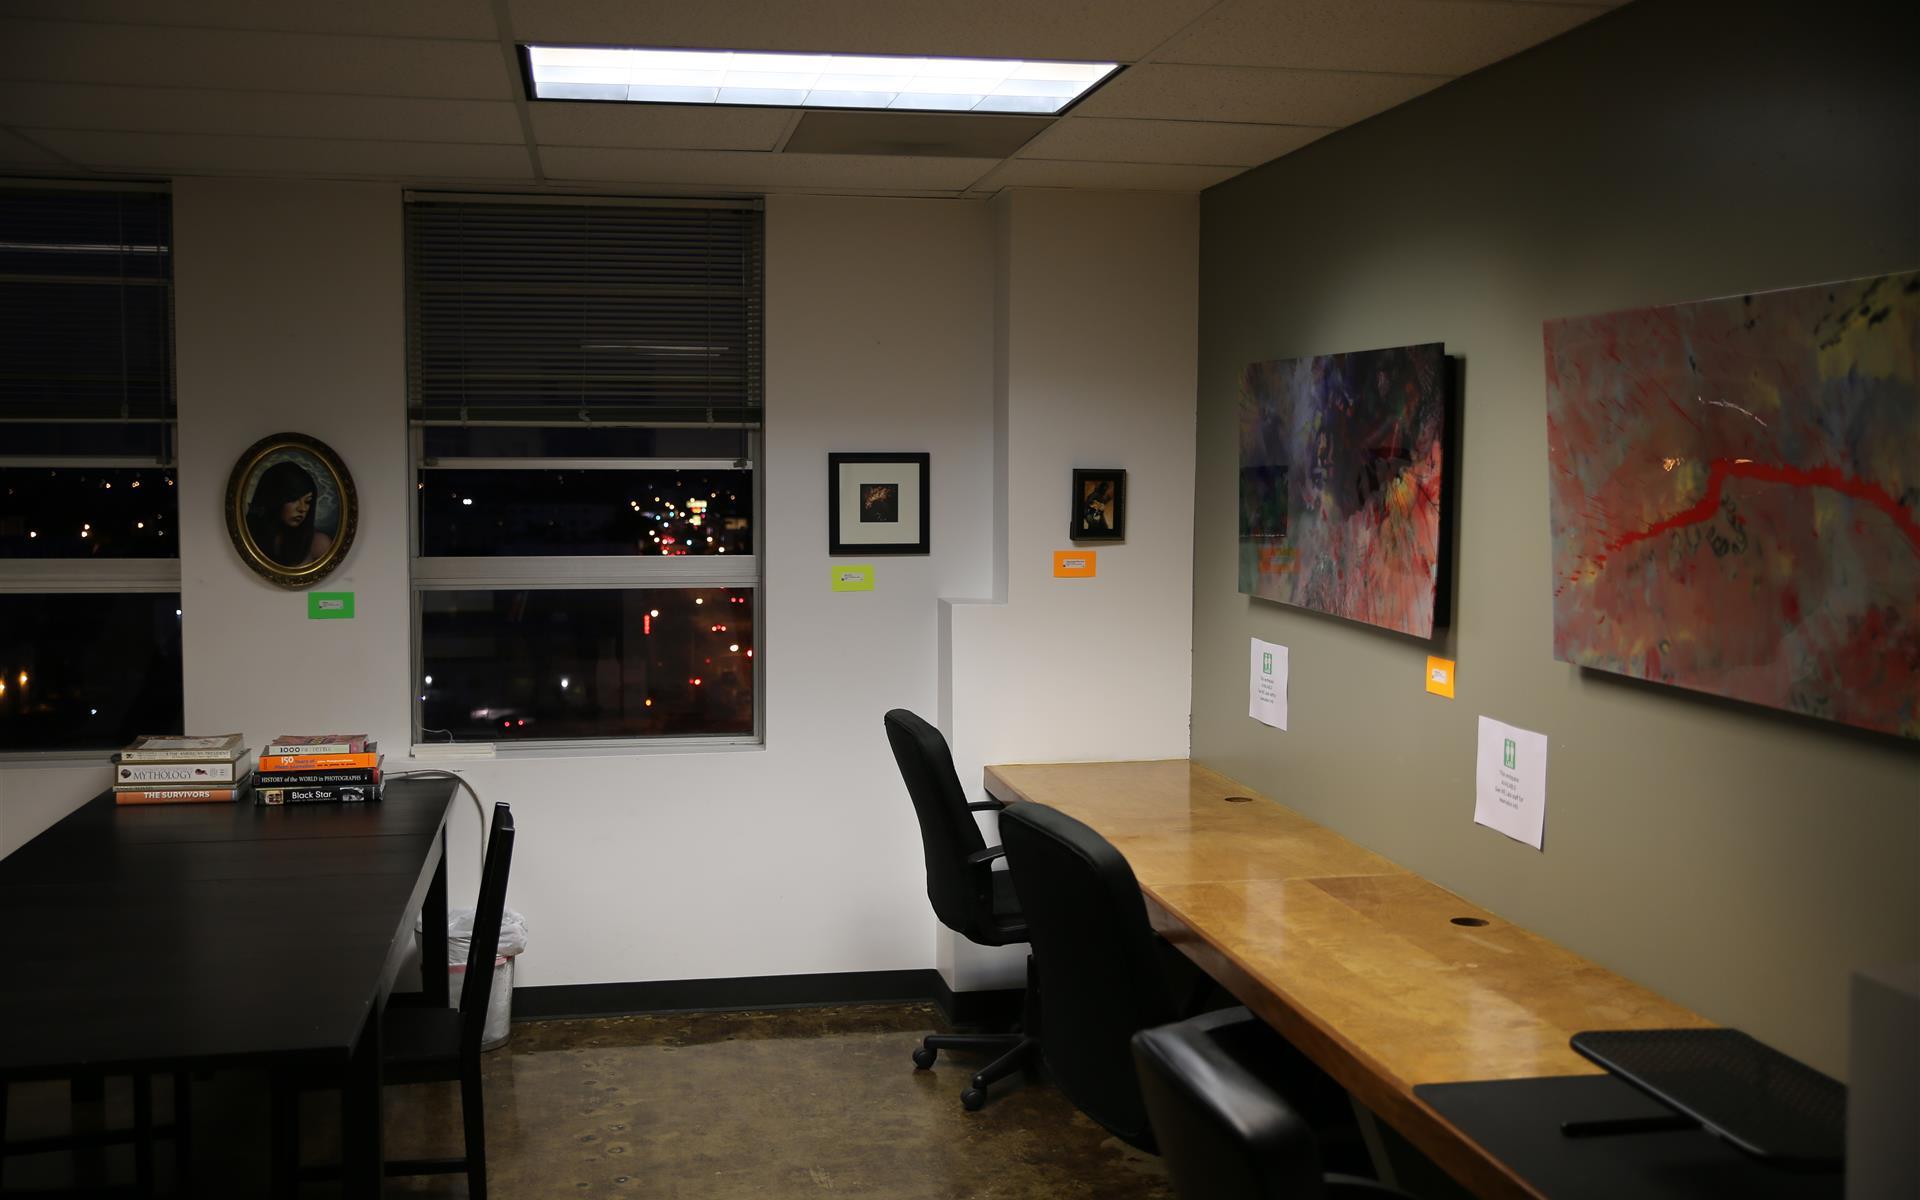 Work Evolution - Dedicated Desk (week 12 month agreement)